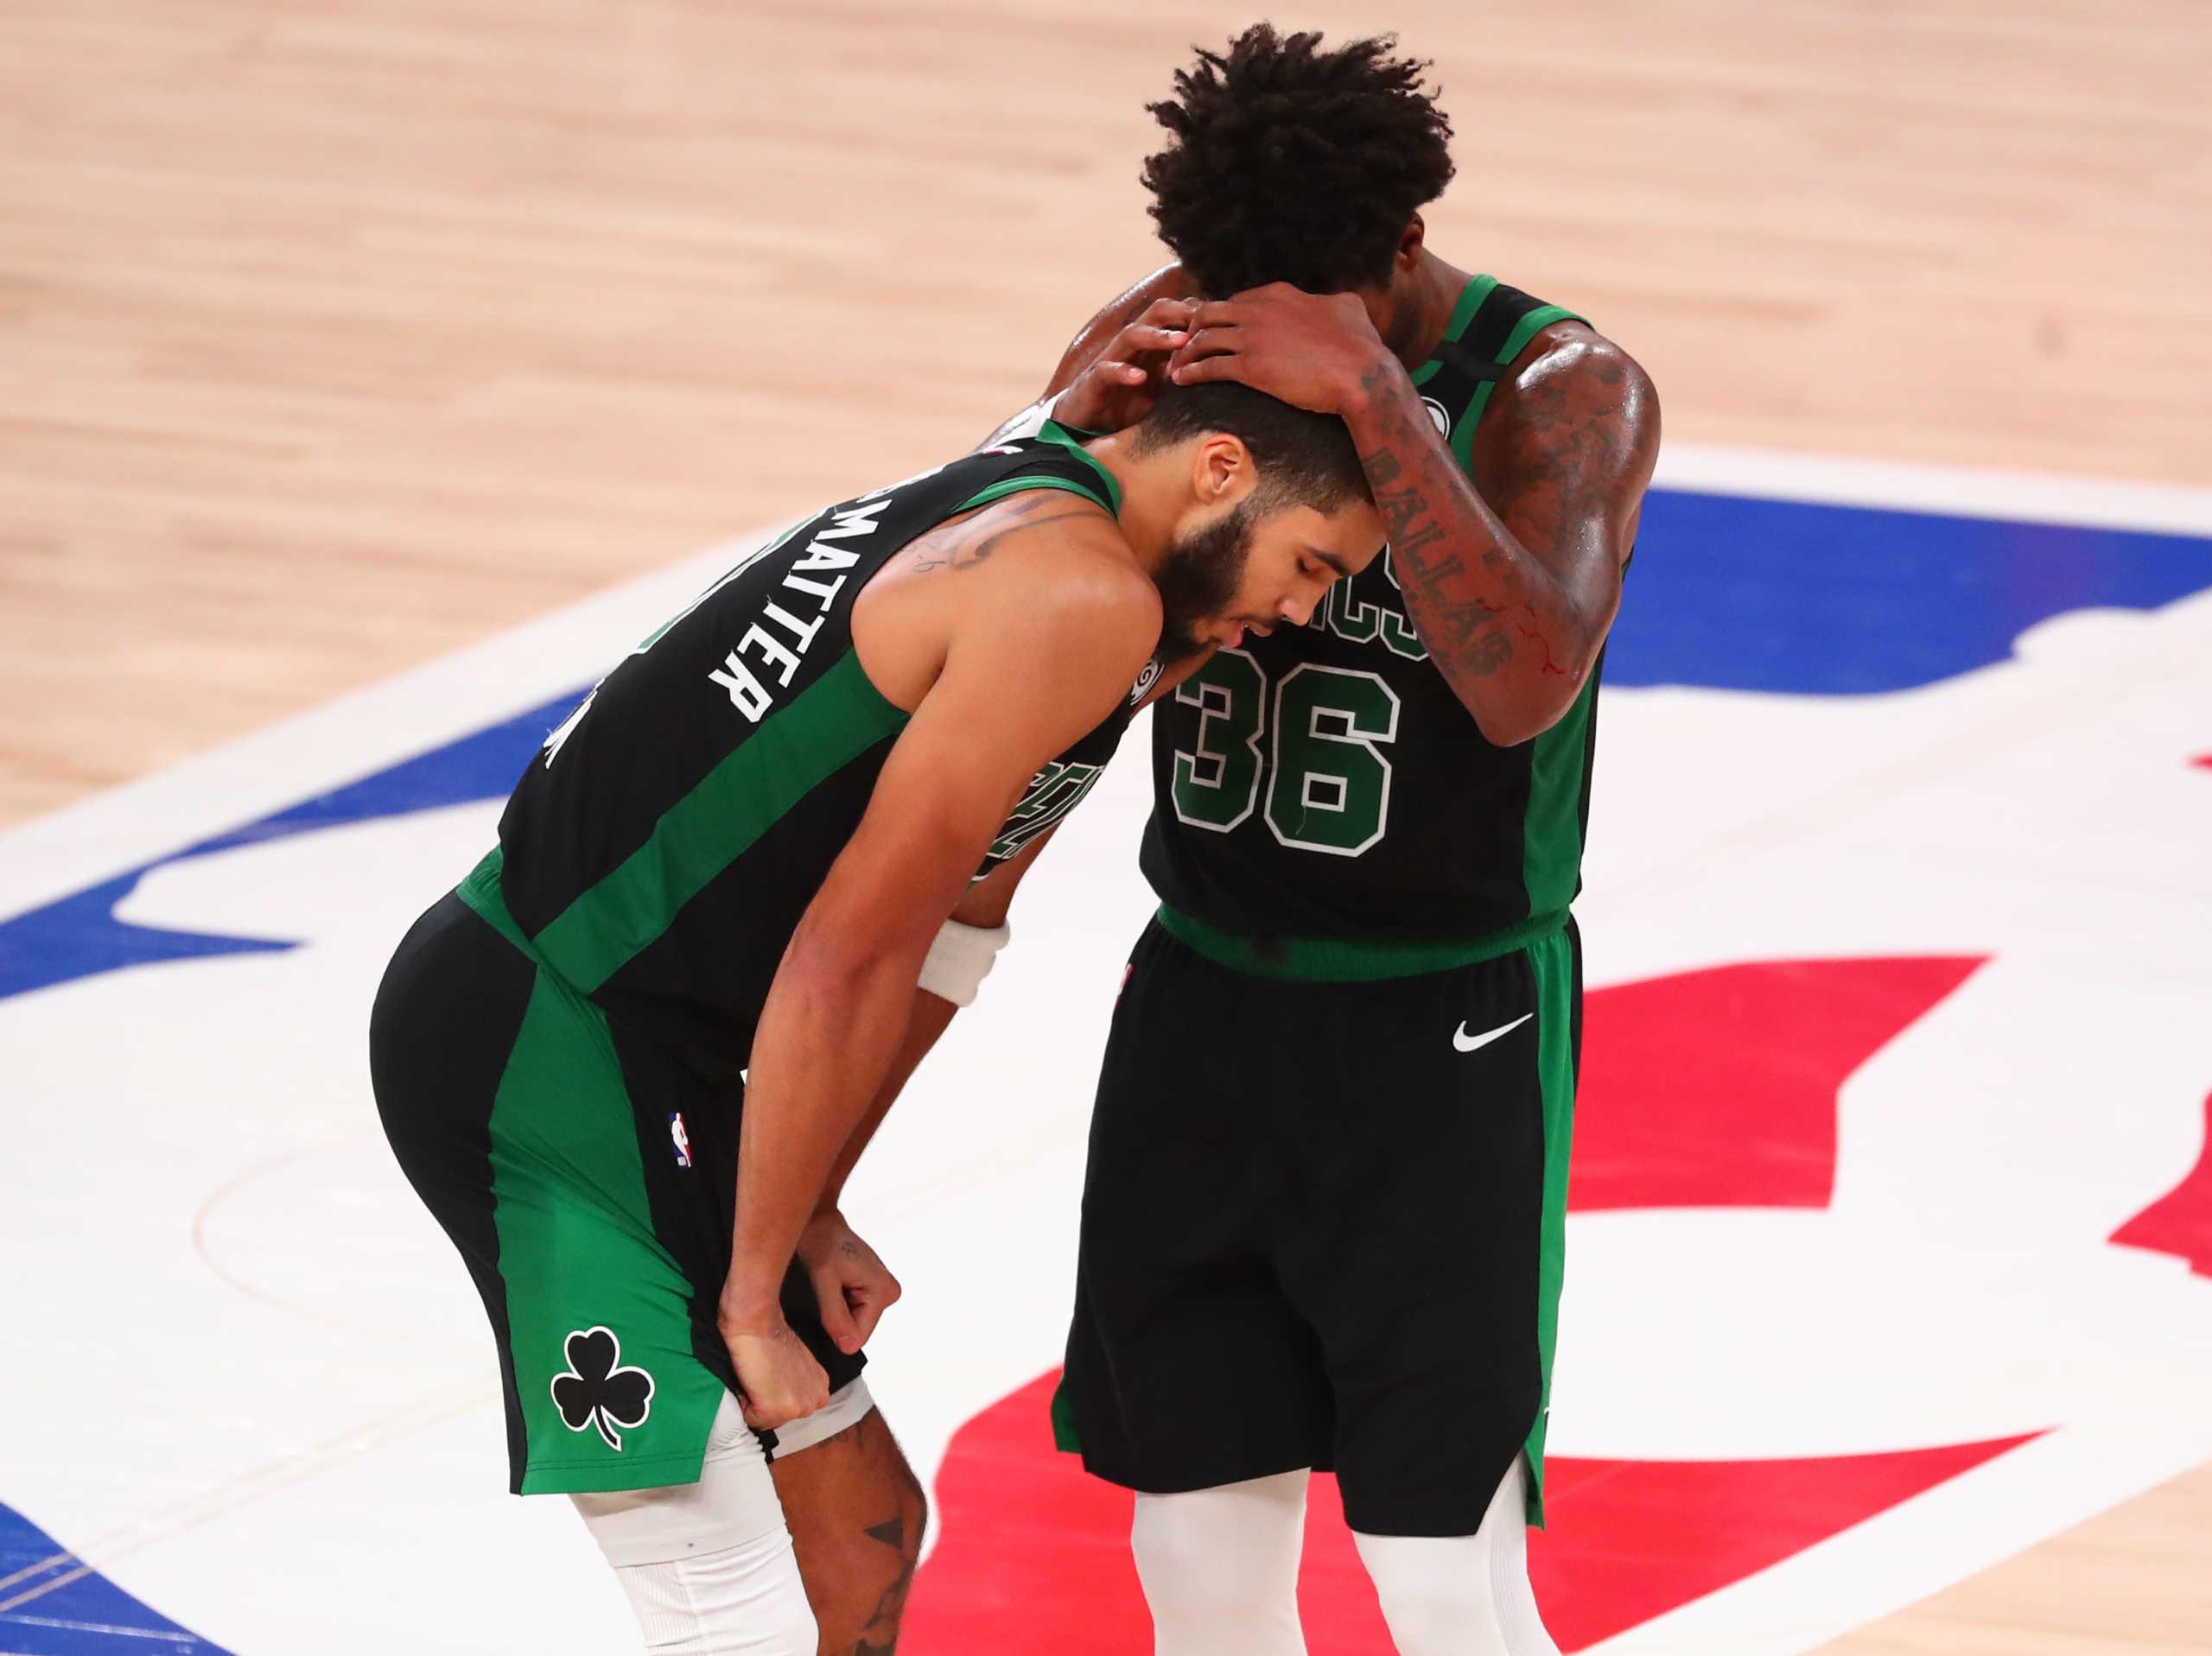 NBA: Αναβολή στο Σέλτικς – Μάτζικ αφού ο κορονοϊός «θέρισε» την ομάδα της Βοστώνης